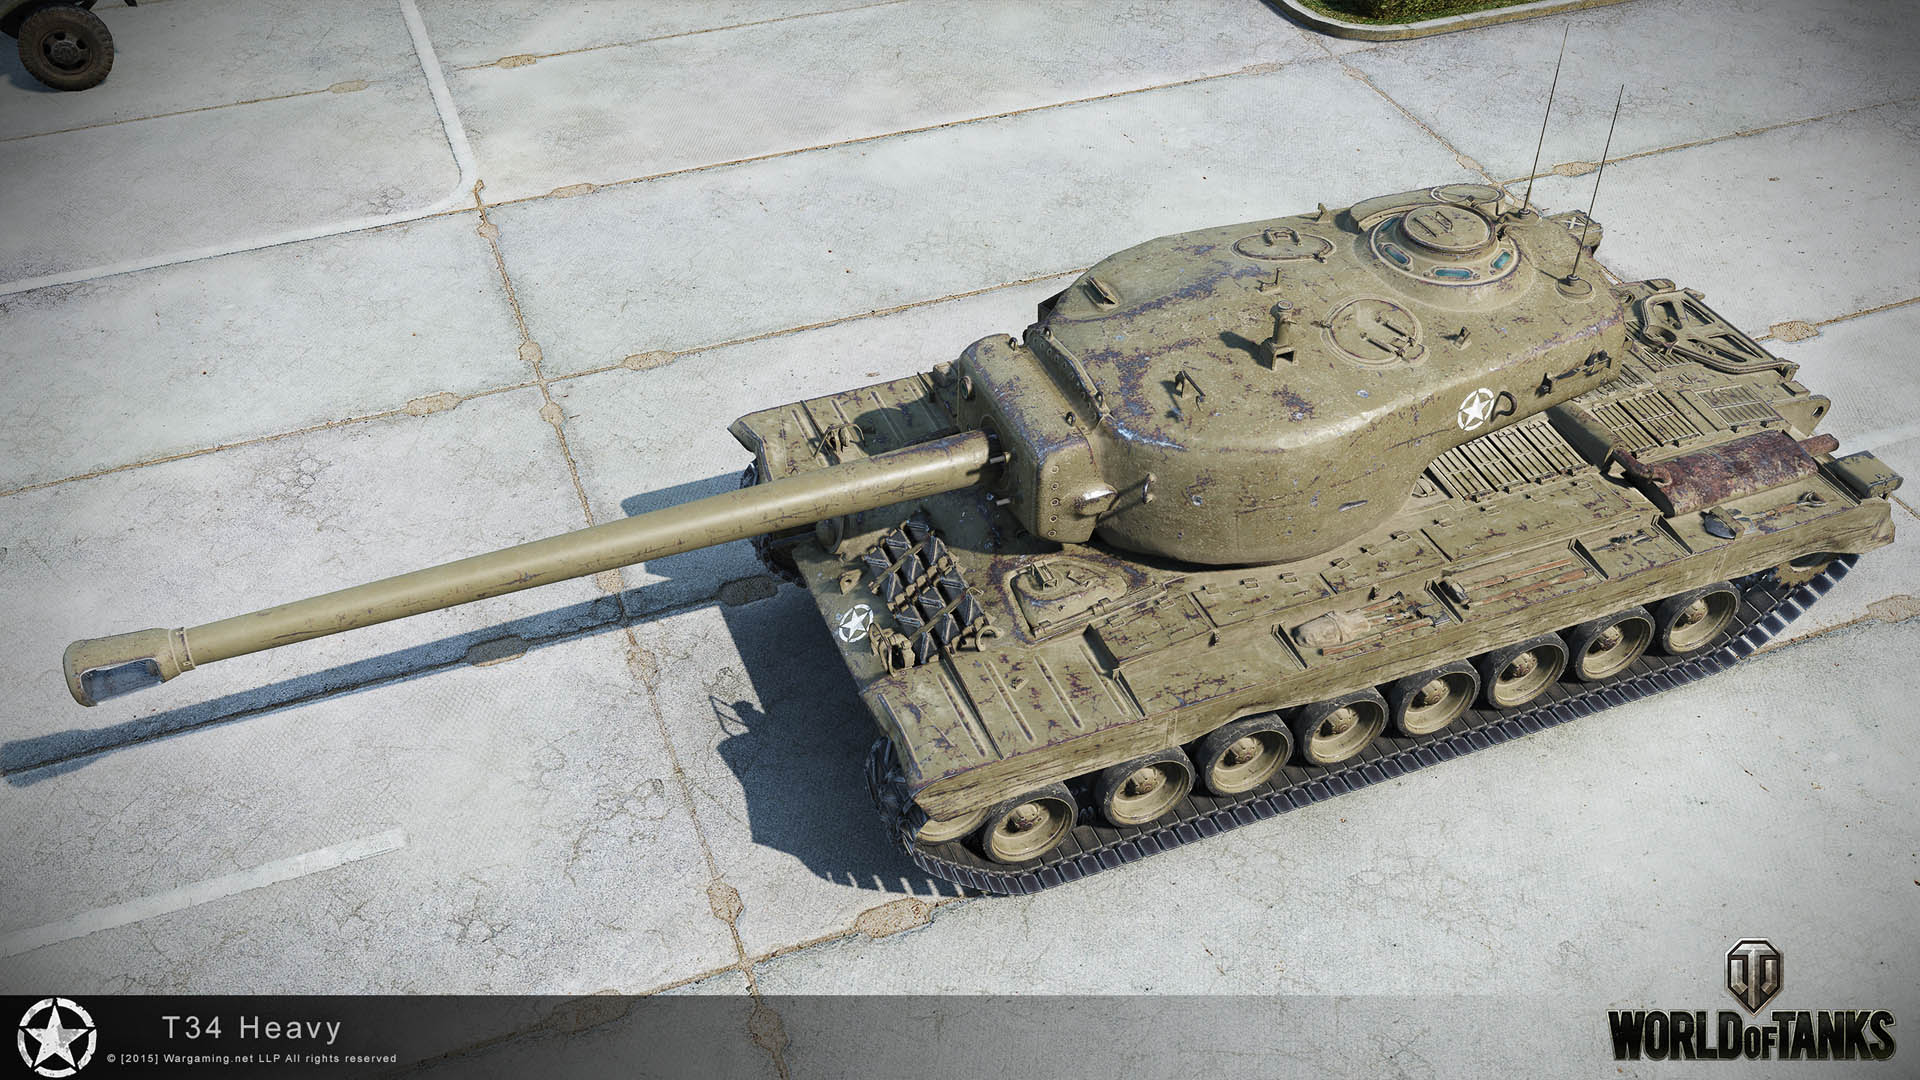 T34 в HD качестве